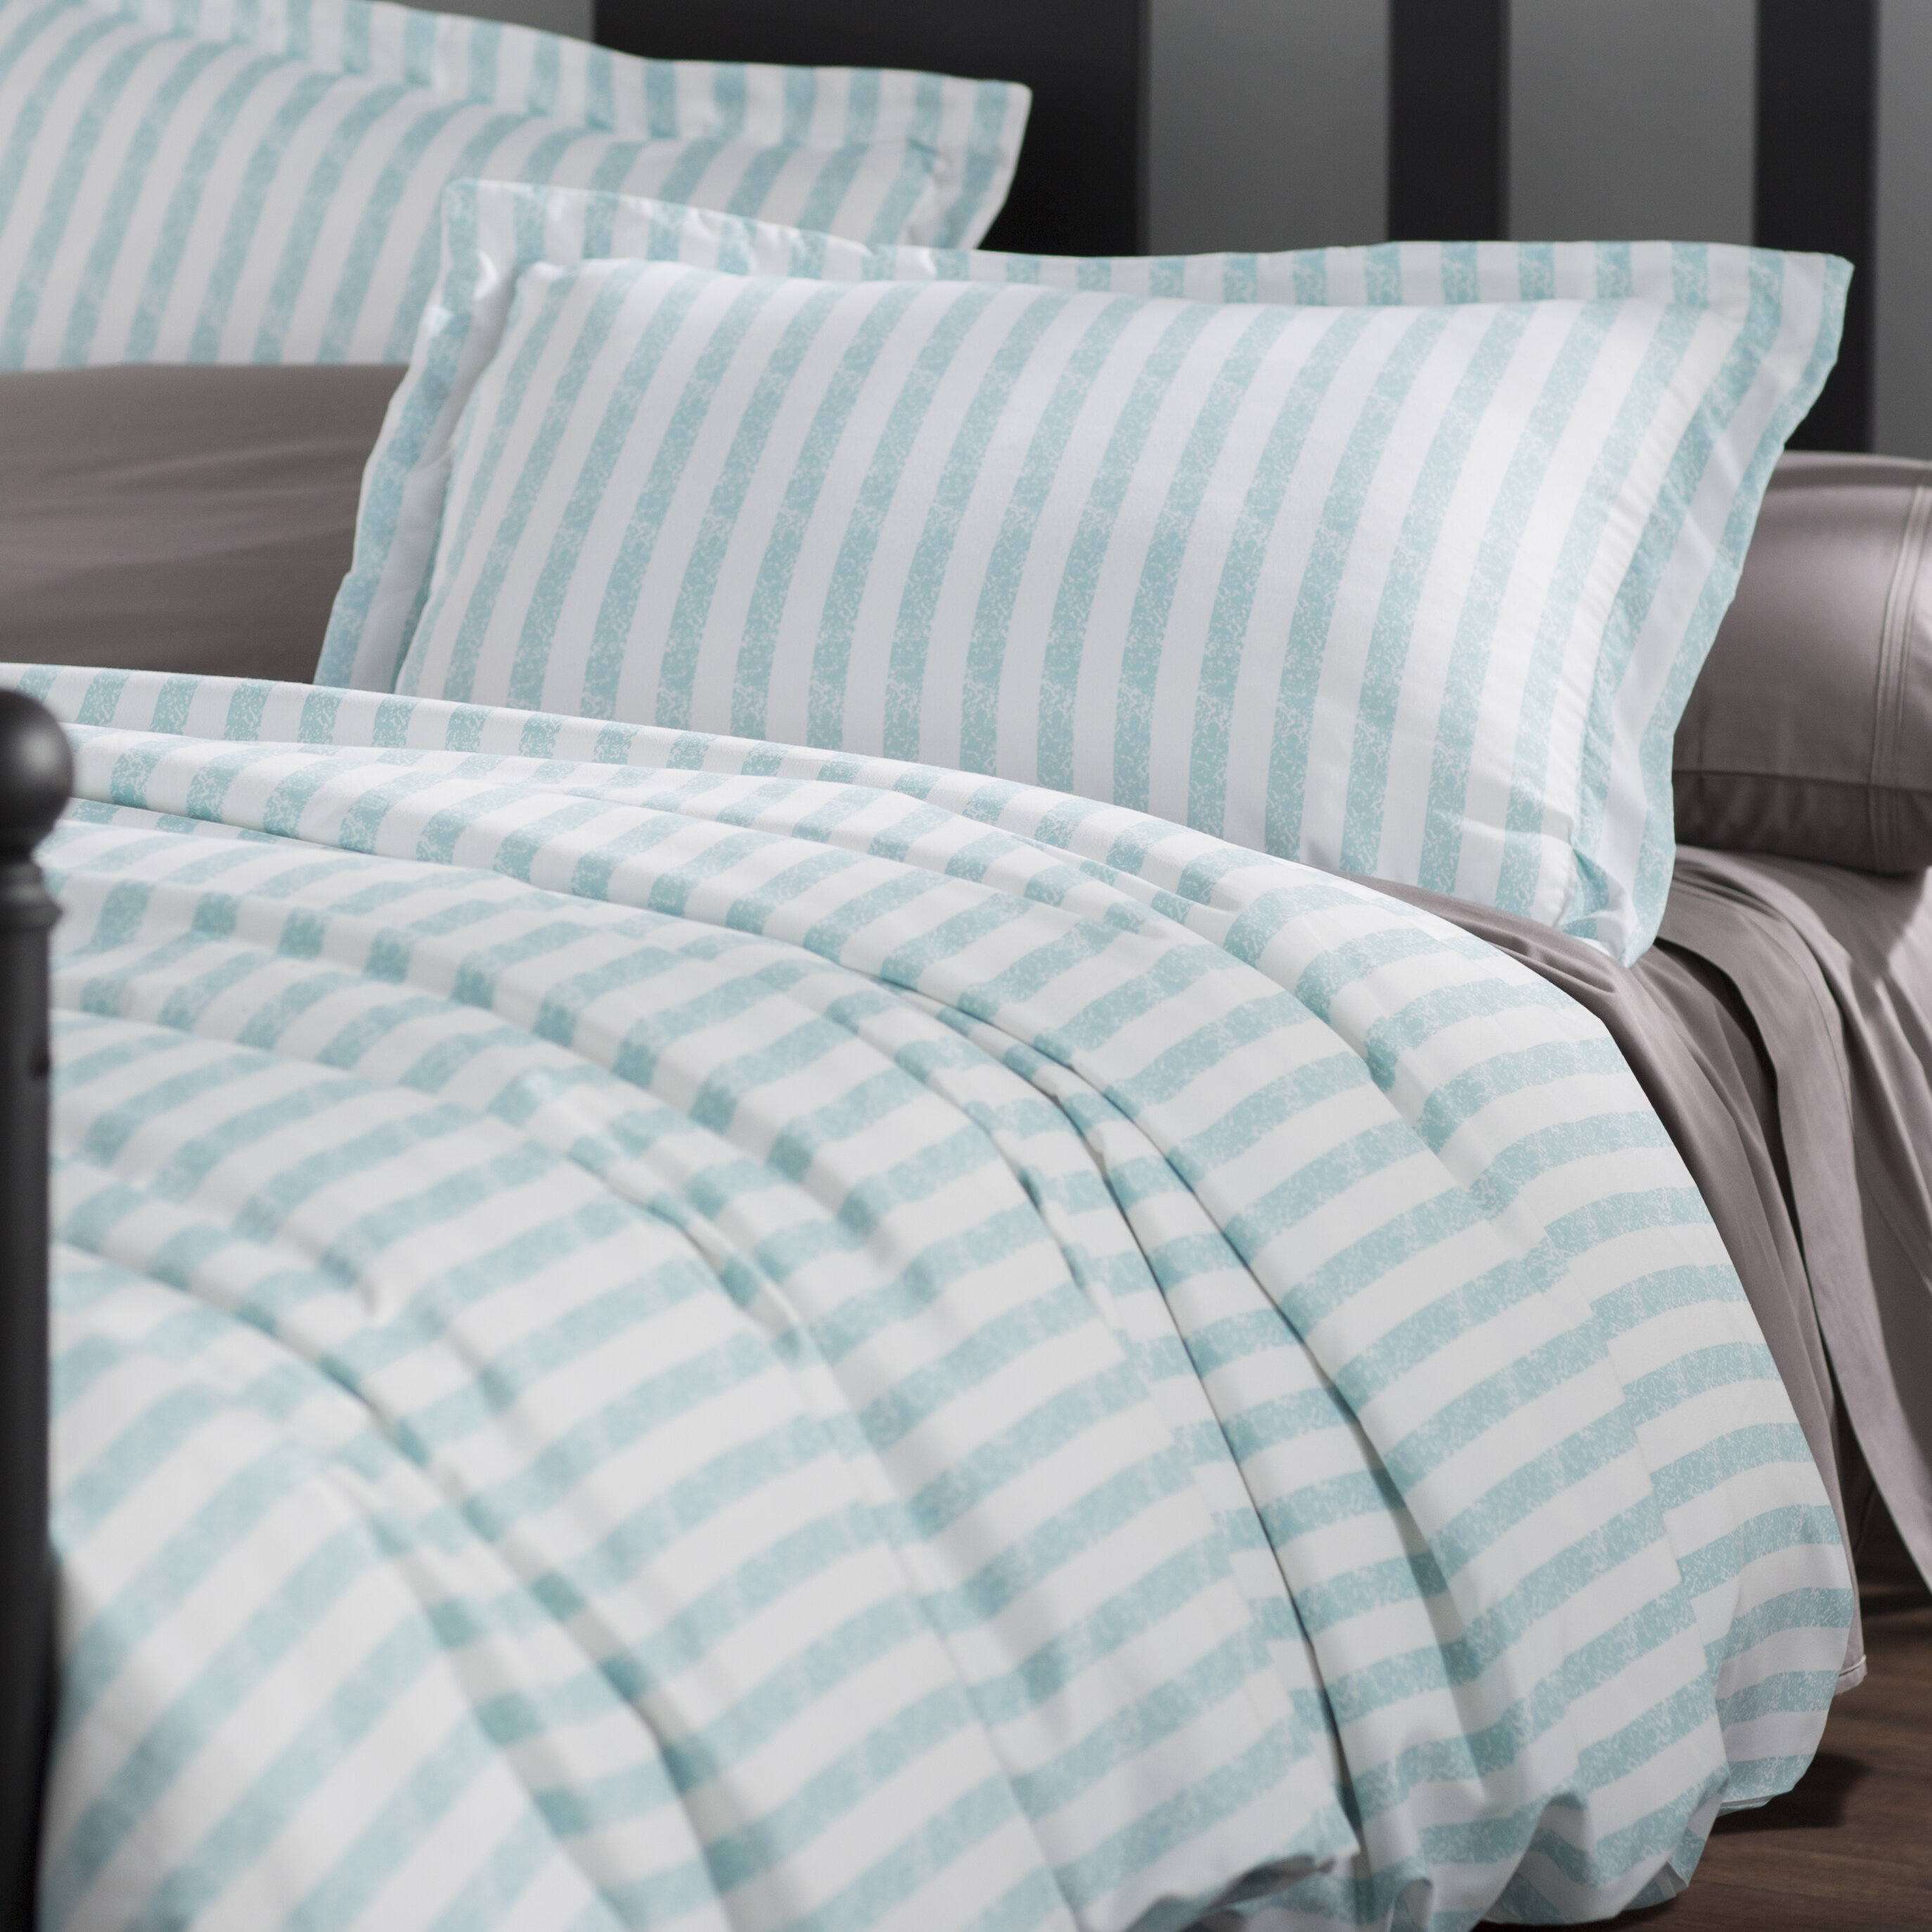 parent com amy twin duvet cover comforter grey sia artisan westpointhome